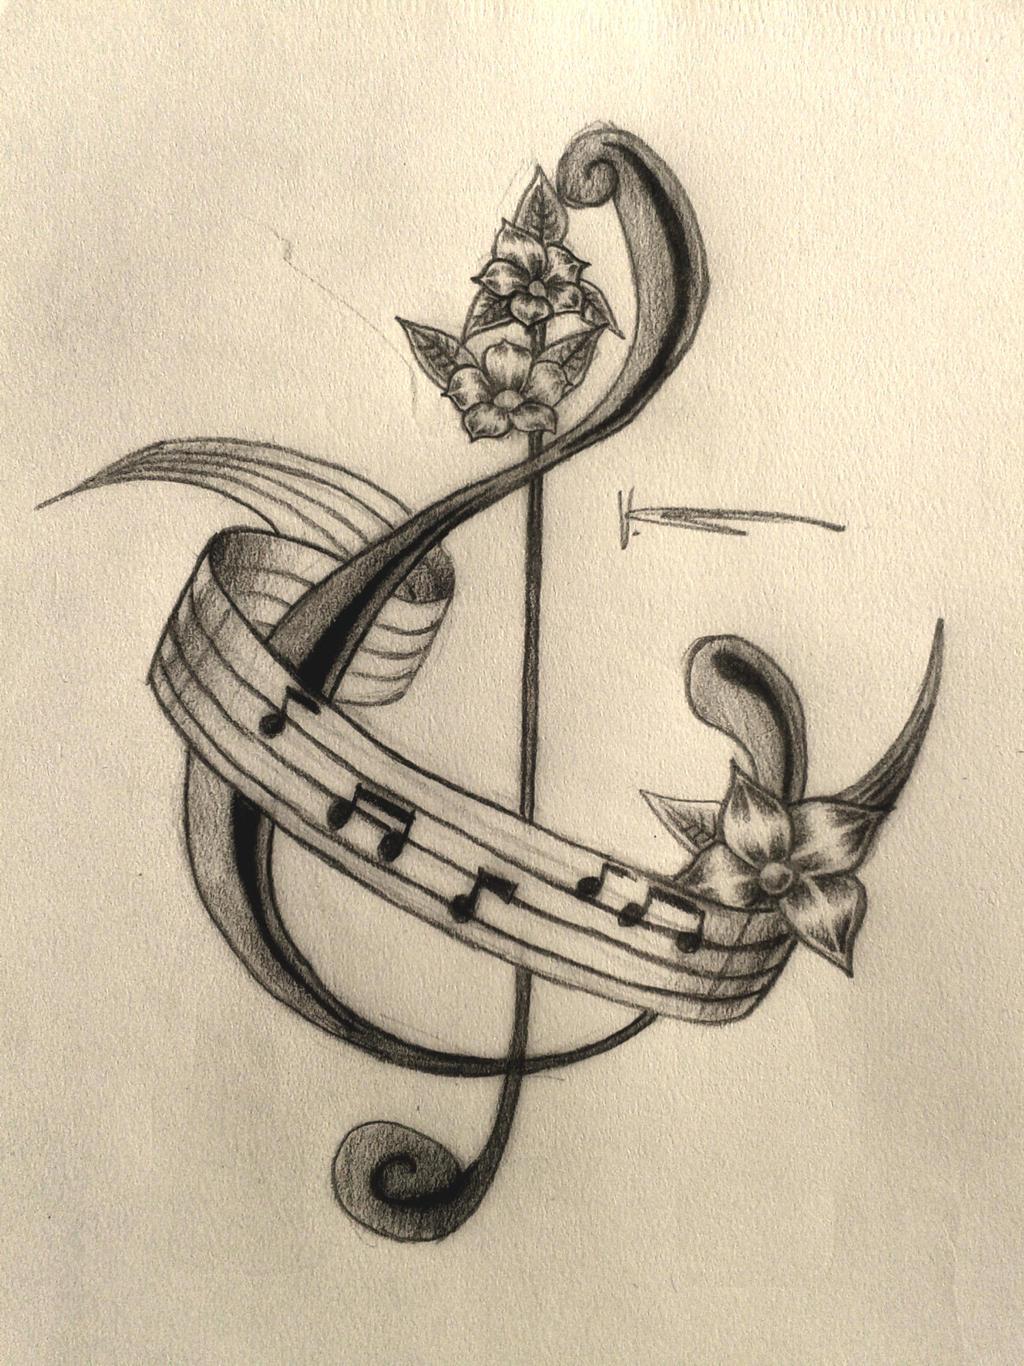 Music Tattoo by xx0vicky0xx on DeviantArt